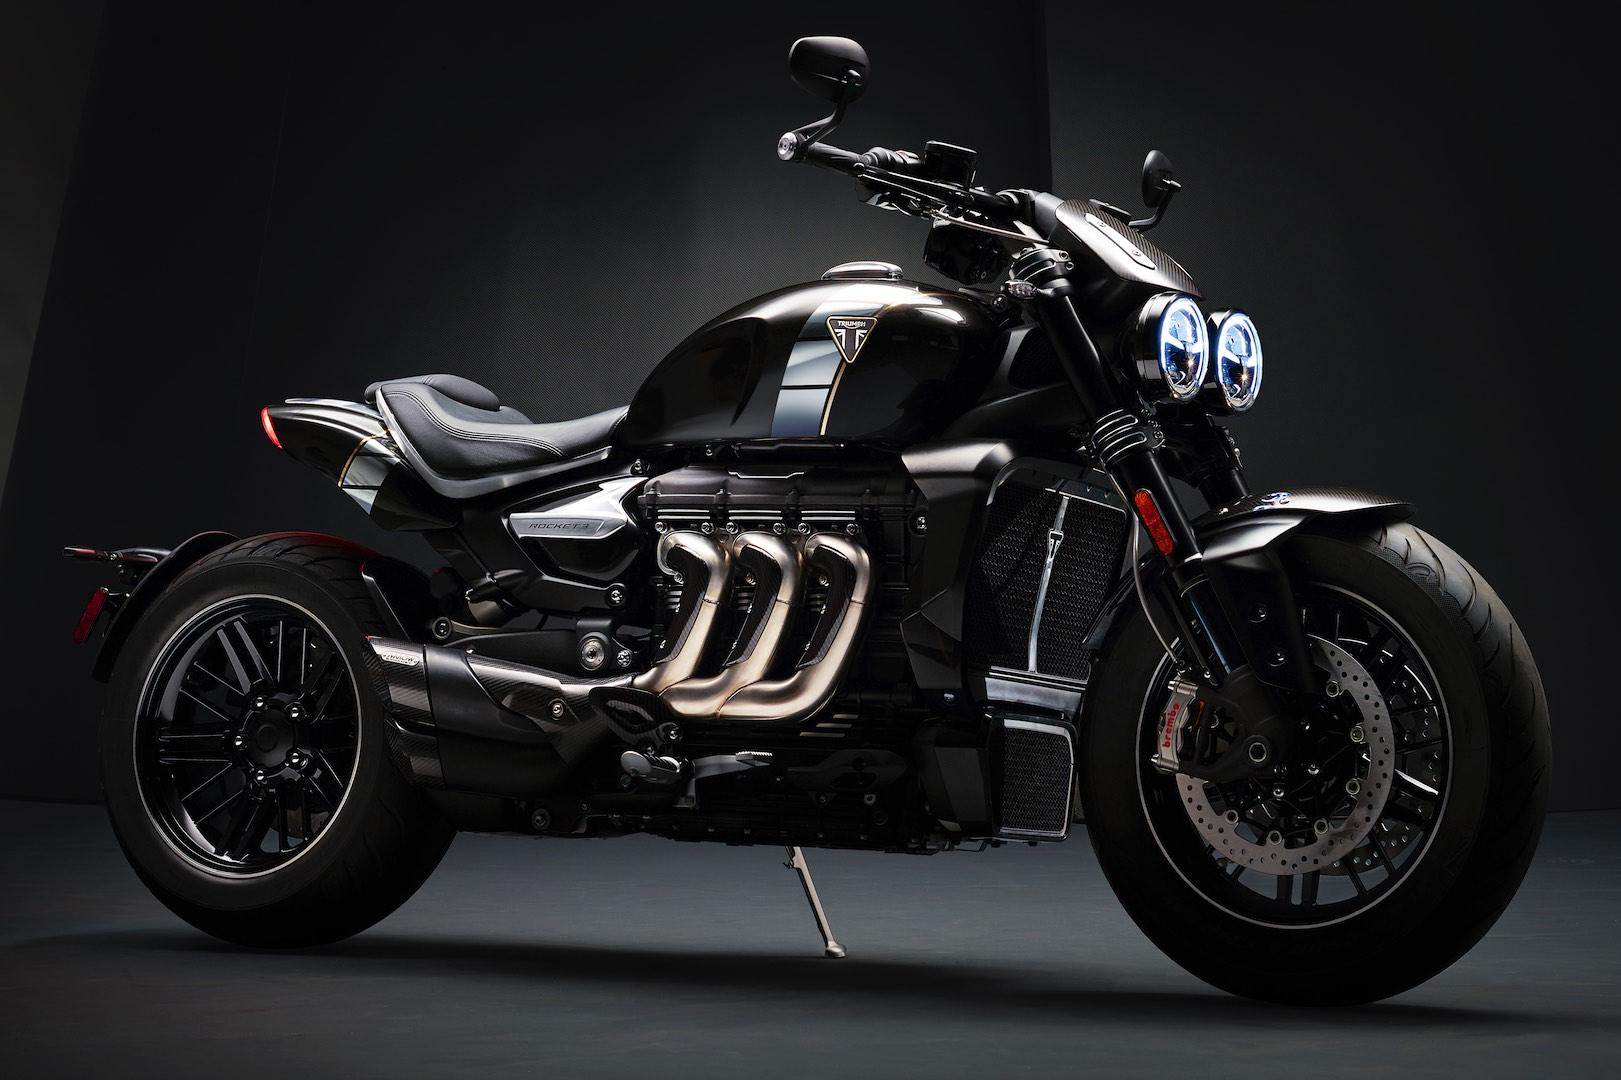 https://i.ibb.co/GktWw3P/2020-Triumph-Rocket-TFC-First-Look-muscle-motorcycle-2.jpg